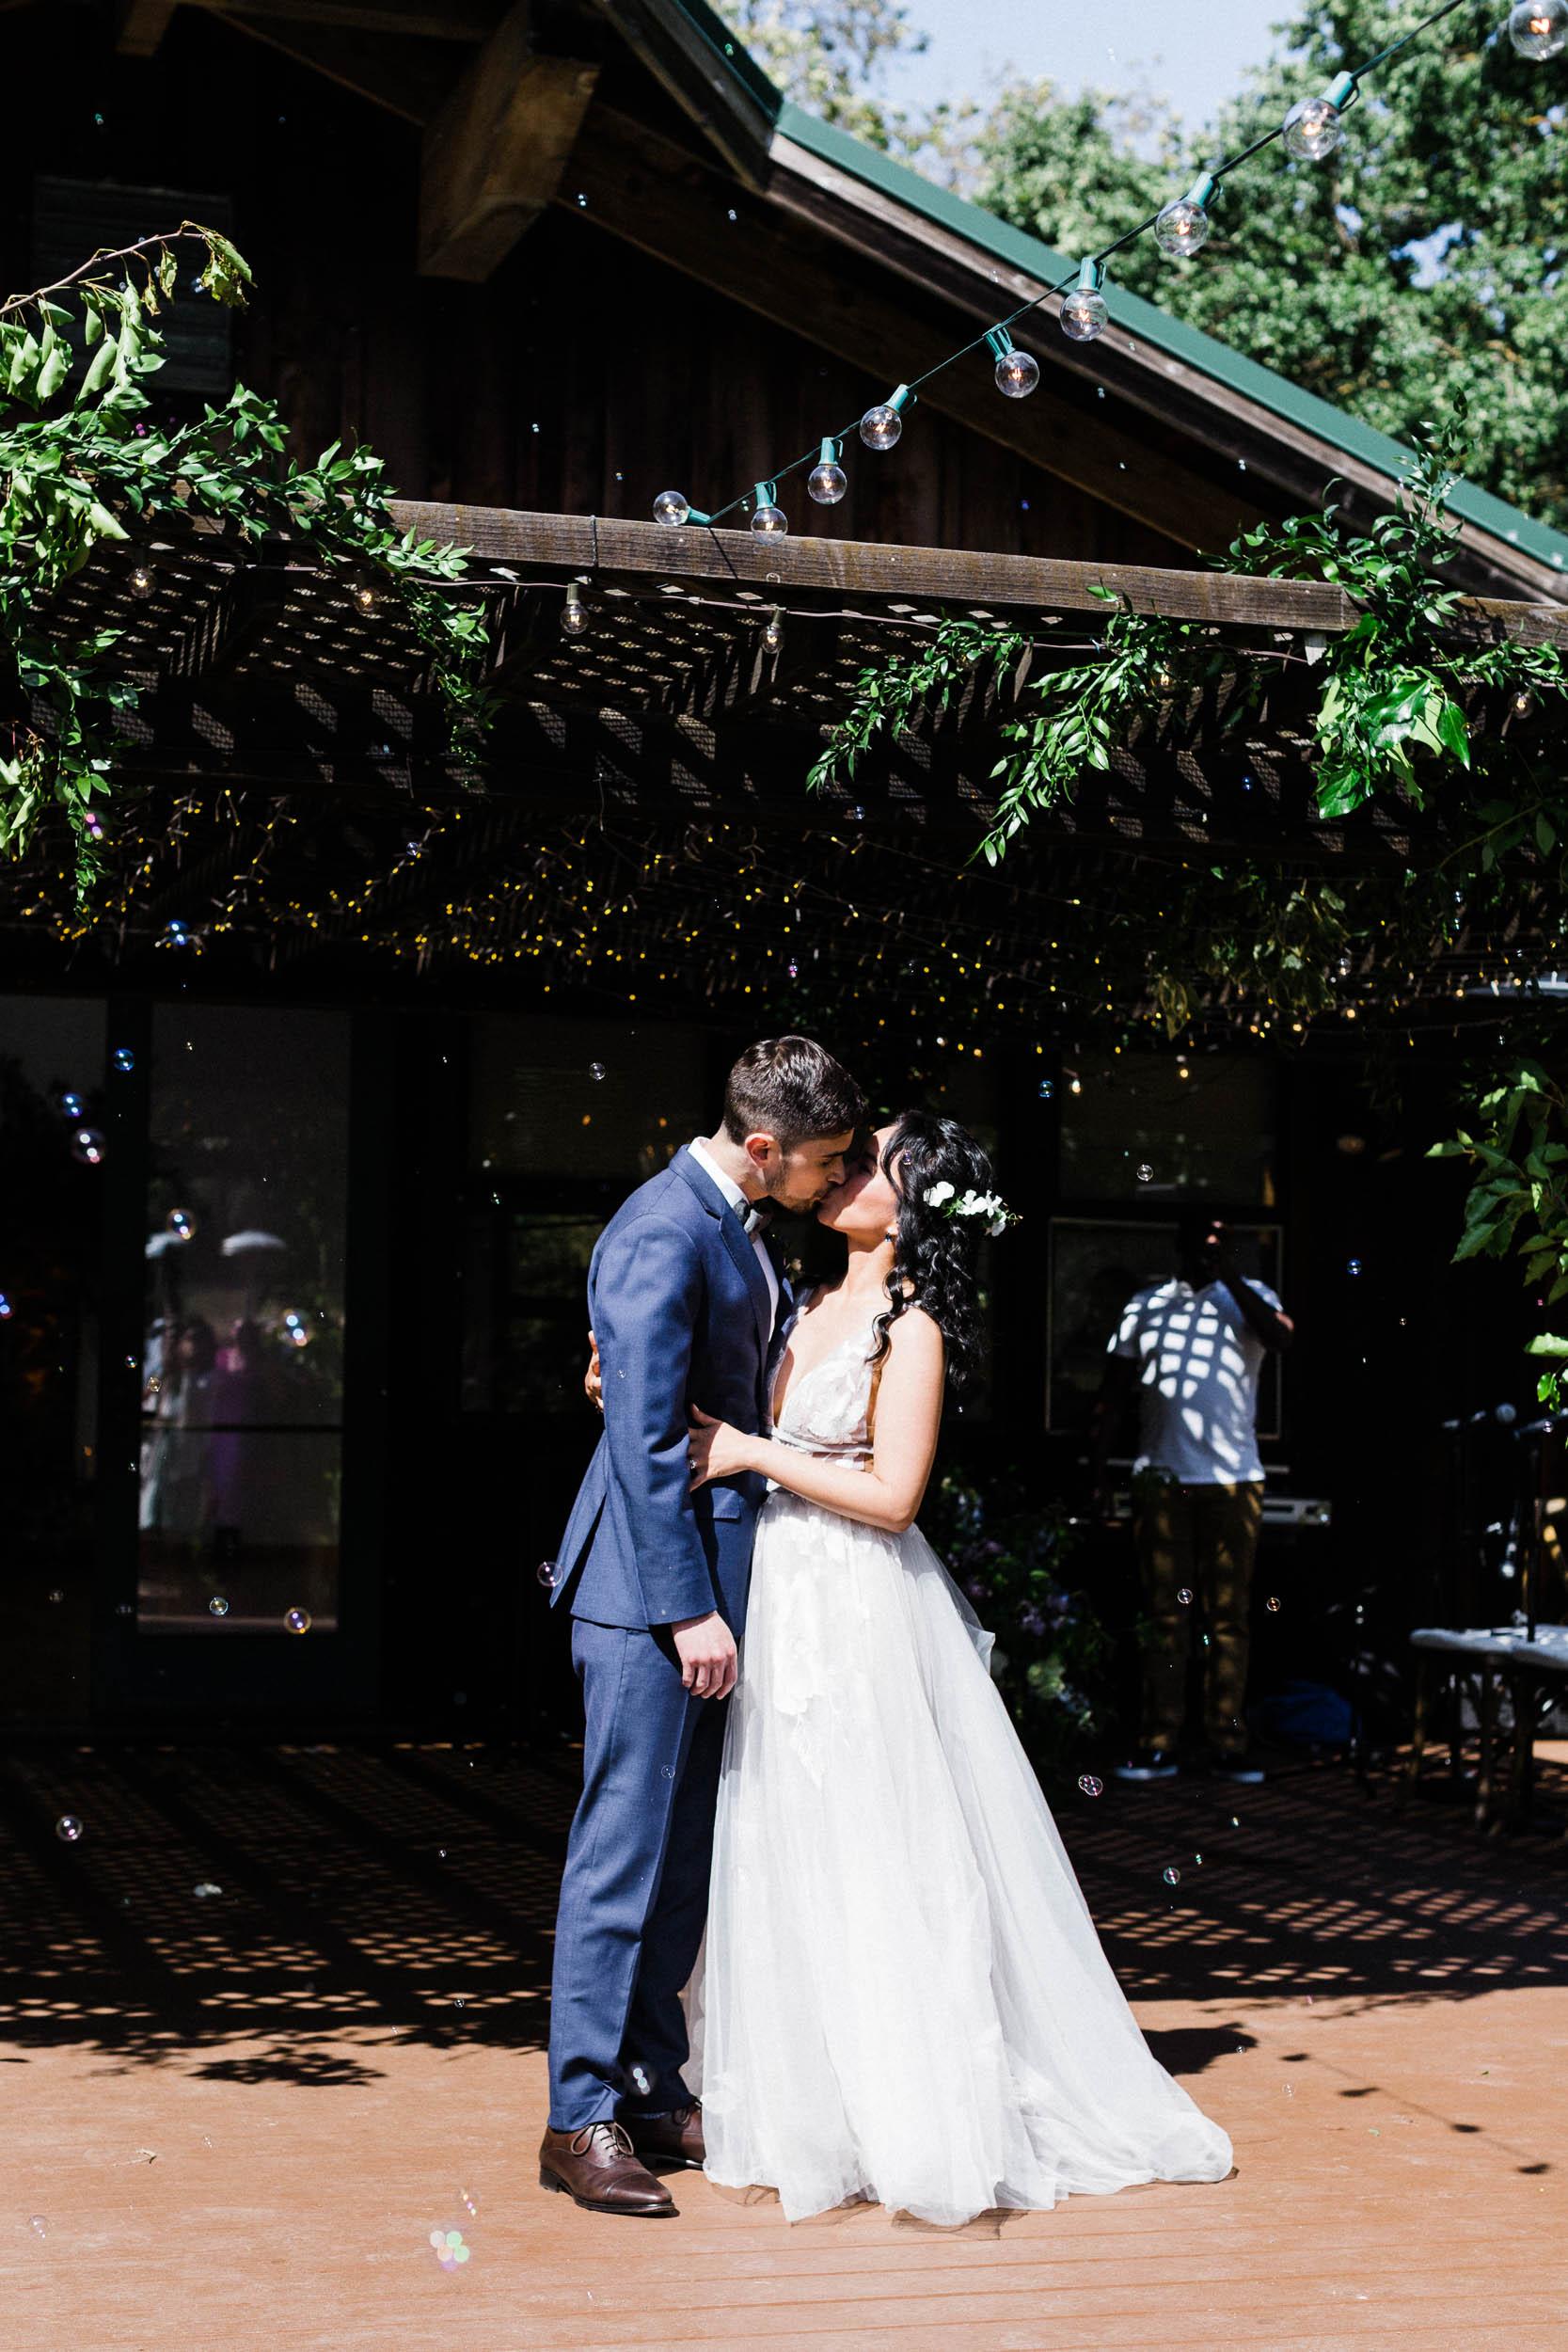 052519_B+S_Hidden Villa Wedding_Buena Lane Photography_052519_0632CY.jpg